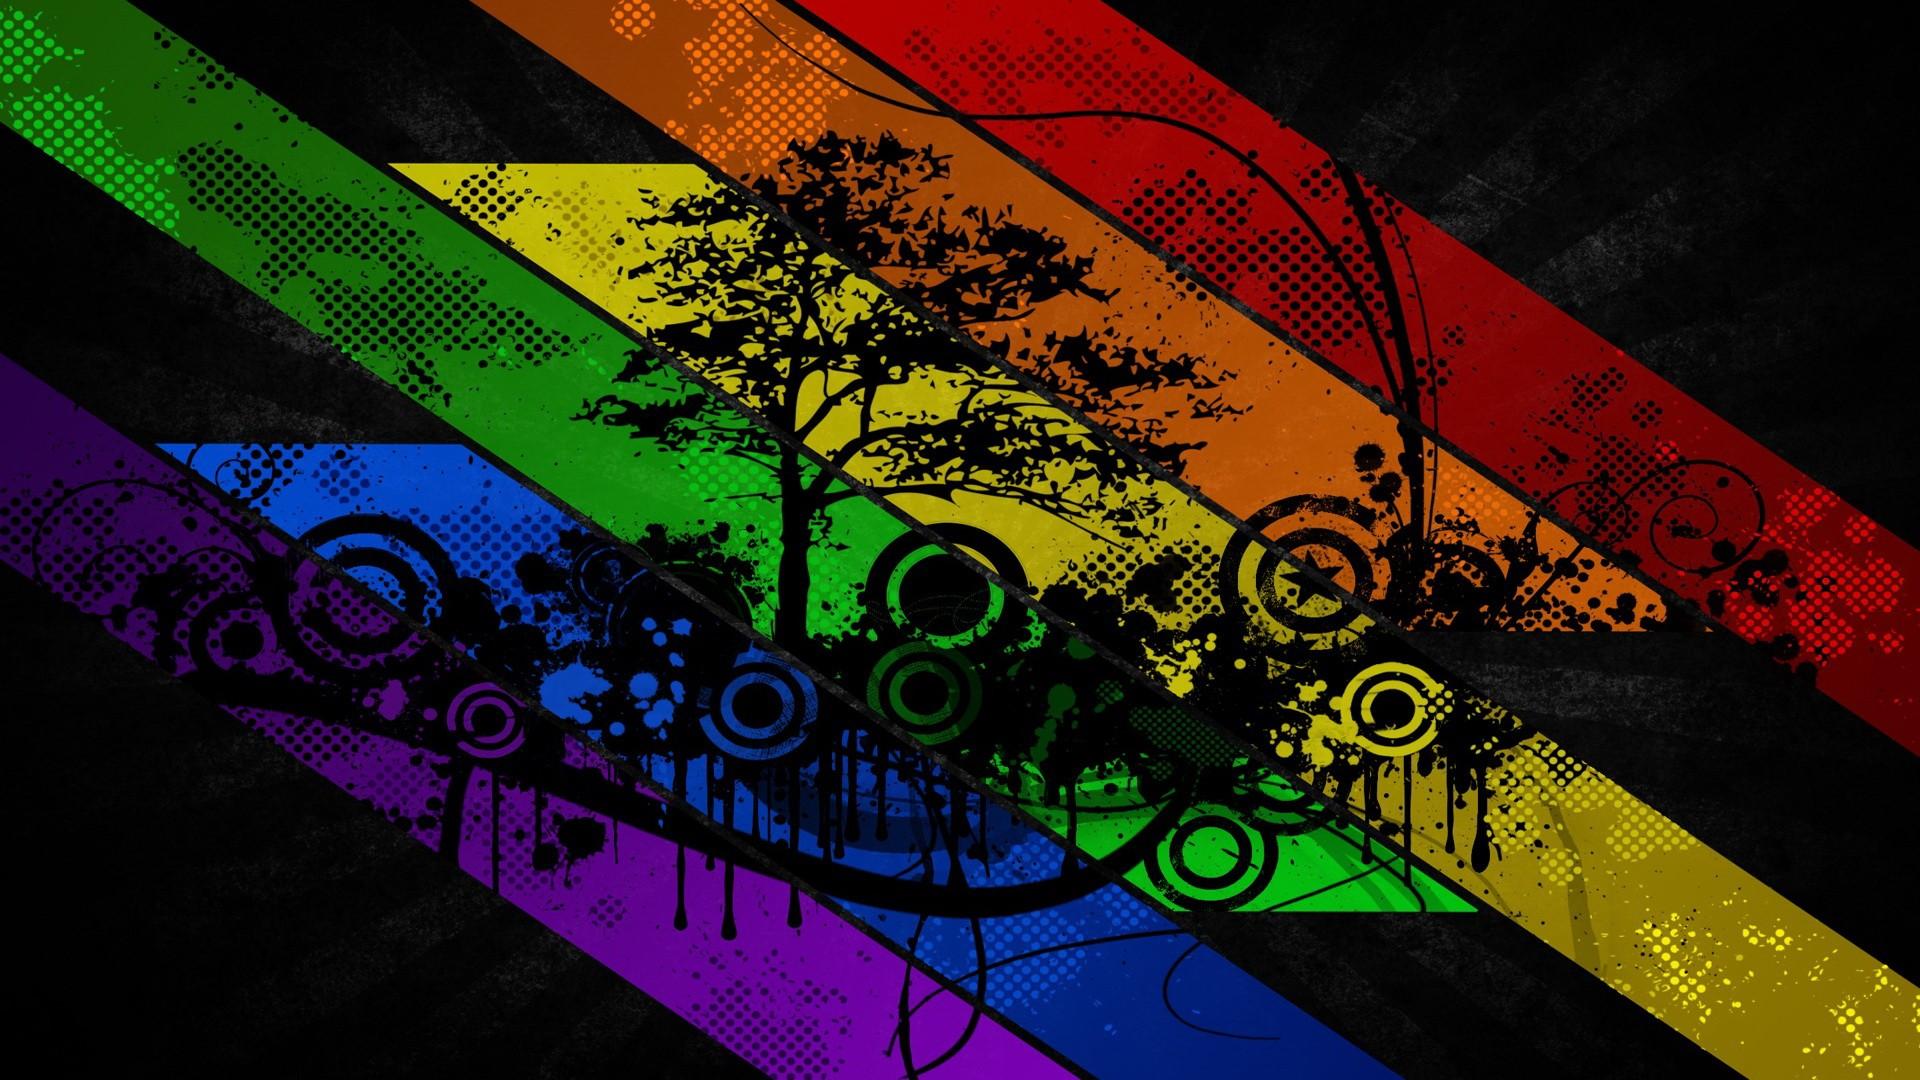 Gay Pride Desktop Wallpapers Wallpapers Cave Desktop